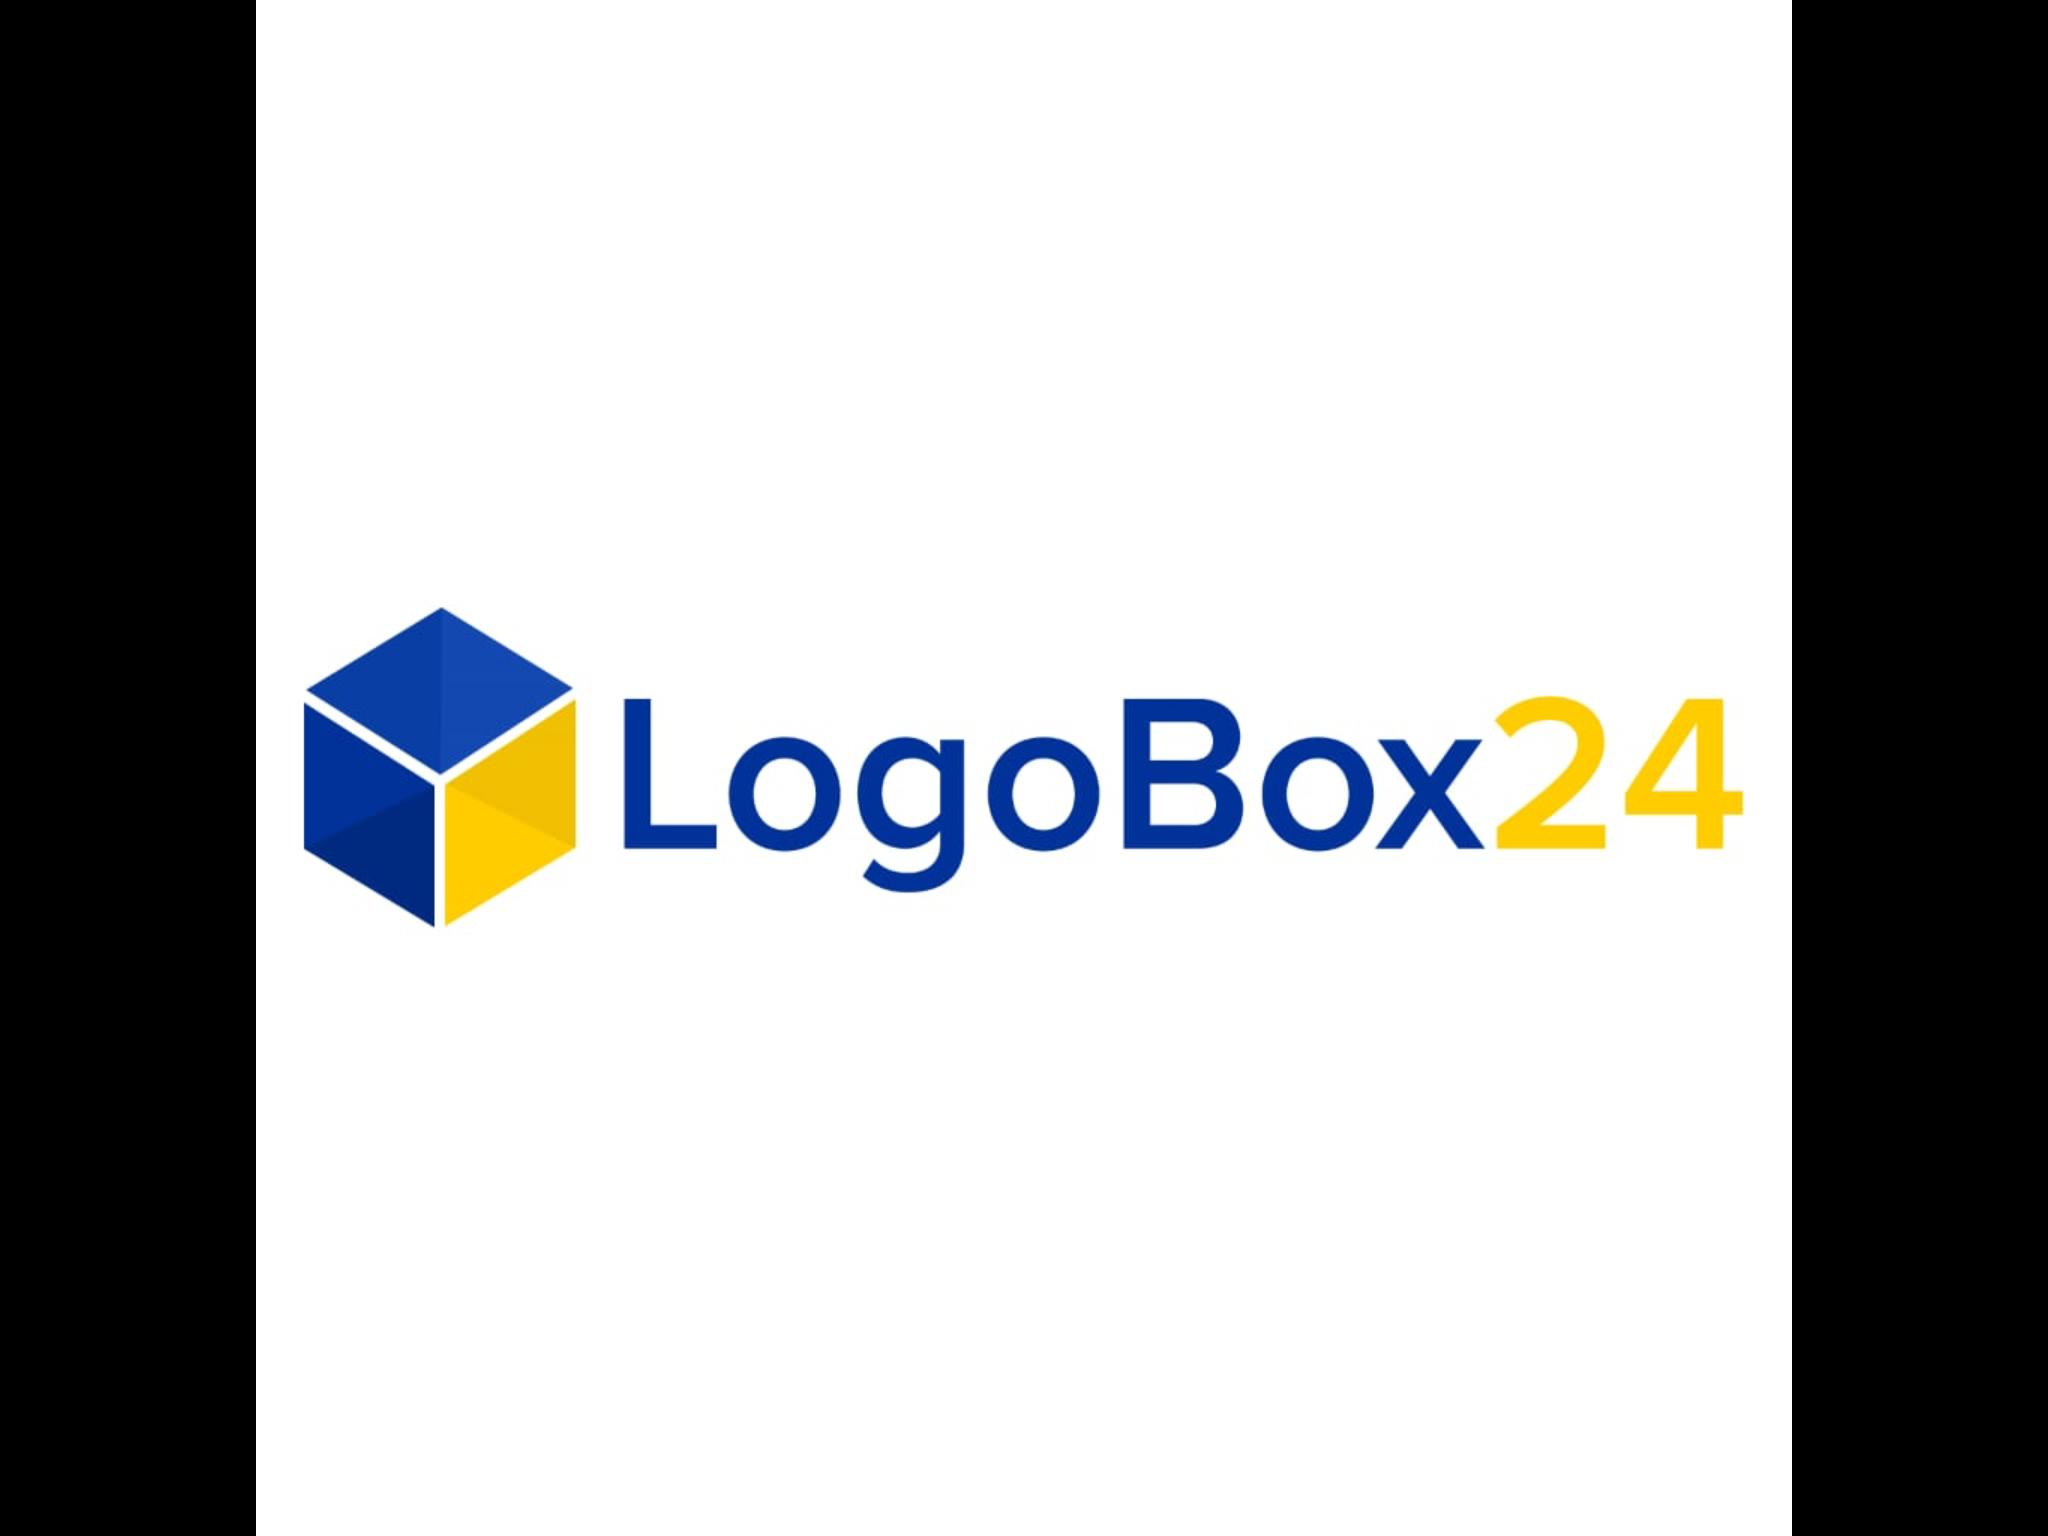 Logobox24 GmbH